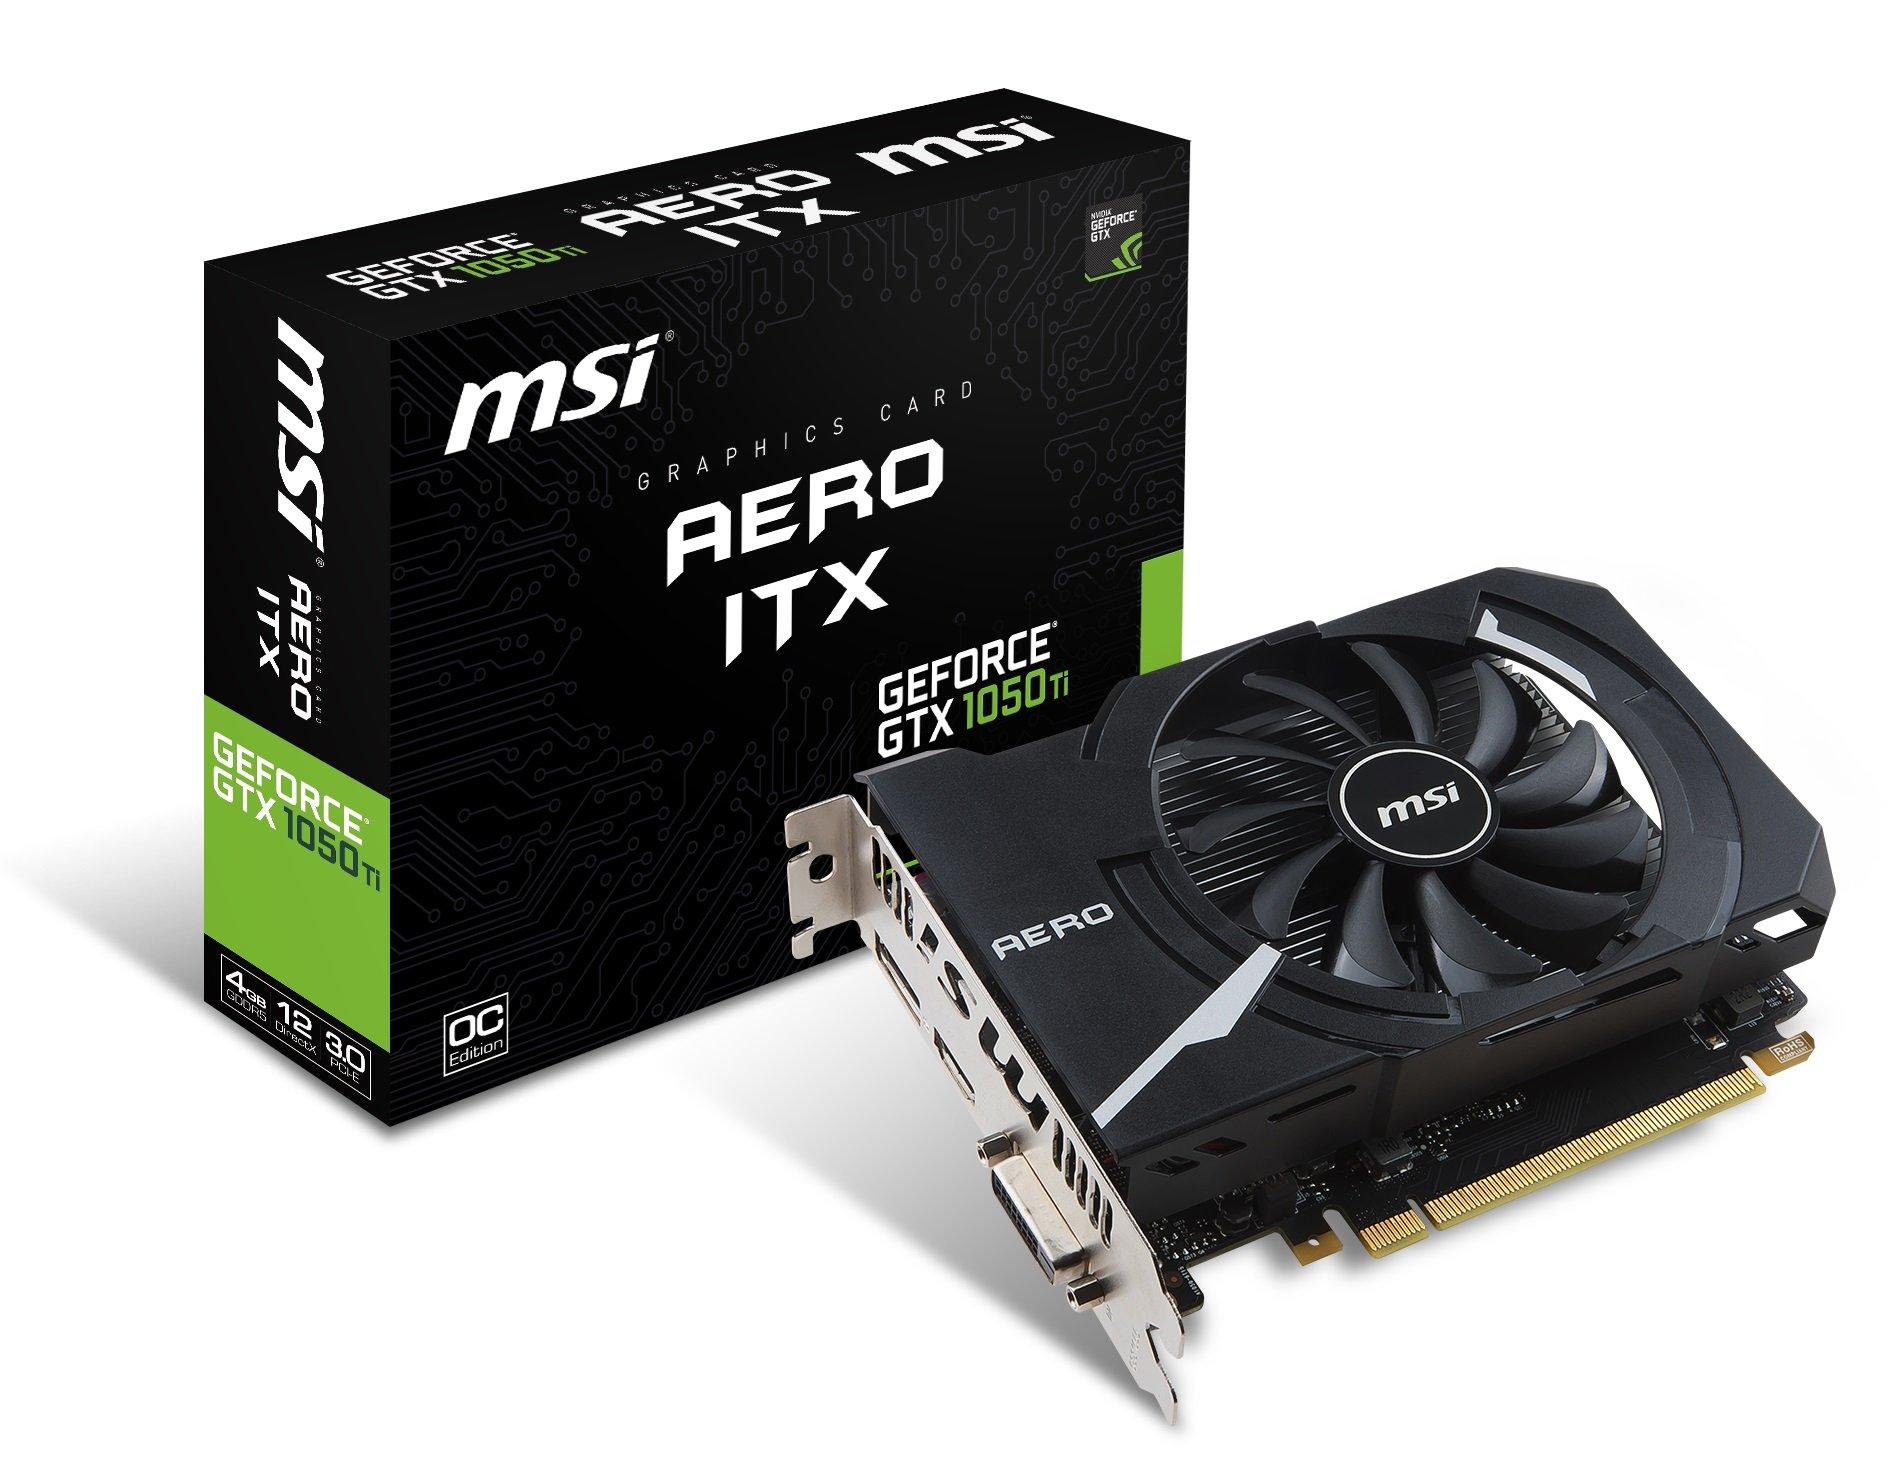 MSI GTX 1050 TI AERO ITX 4G OC Gaming GeForce GTX 1050 Ti 4GB GDDR5 DirectX 12 ITX Graphics Card